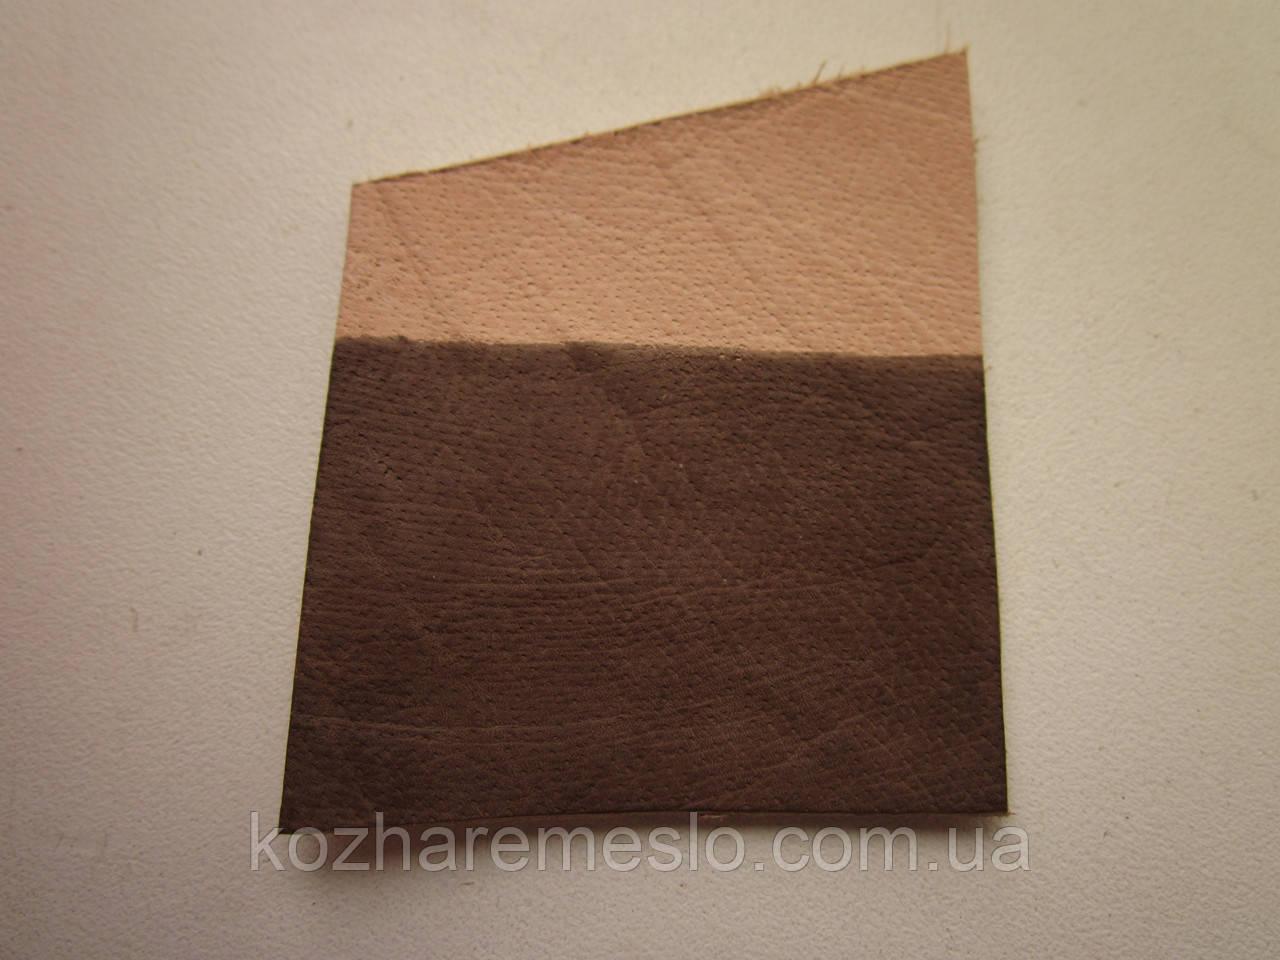 Фарба для шкіри спиртова TOLEDO SUPER 100 мл коричнева (кора)